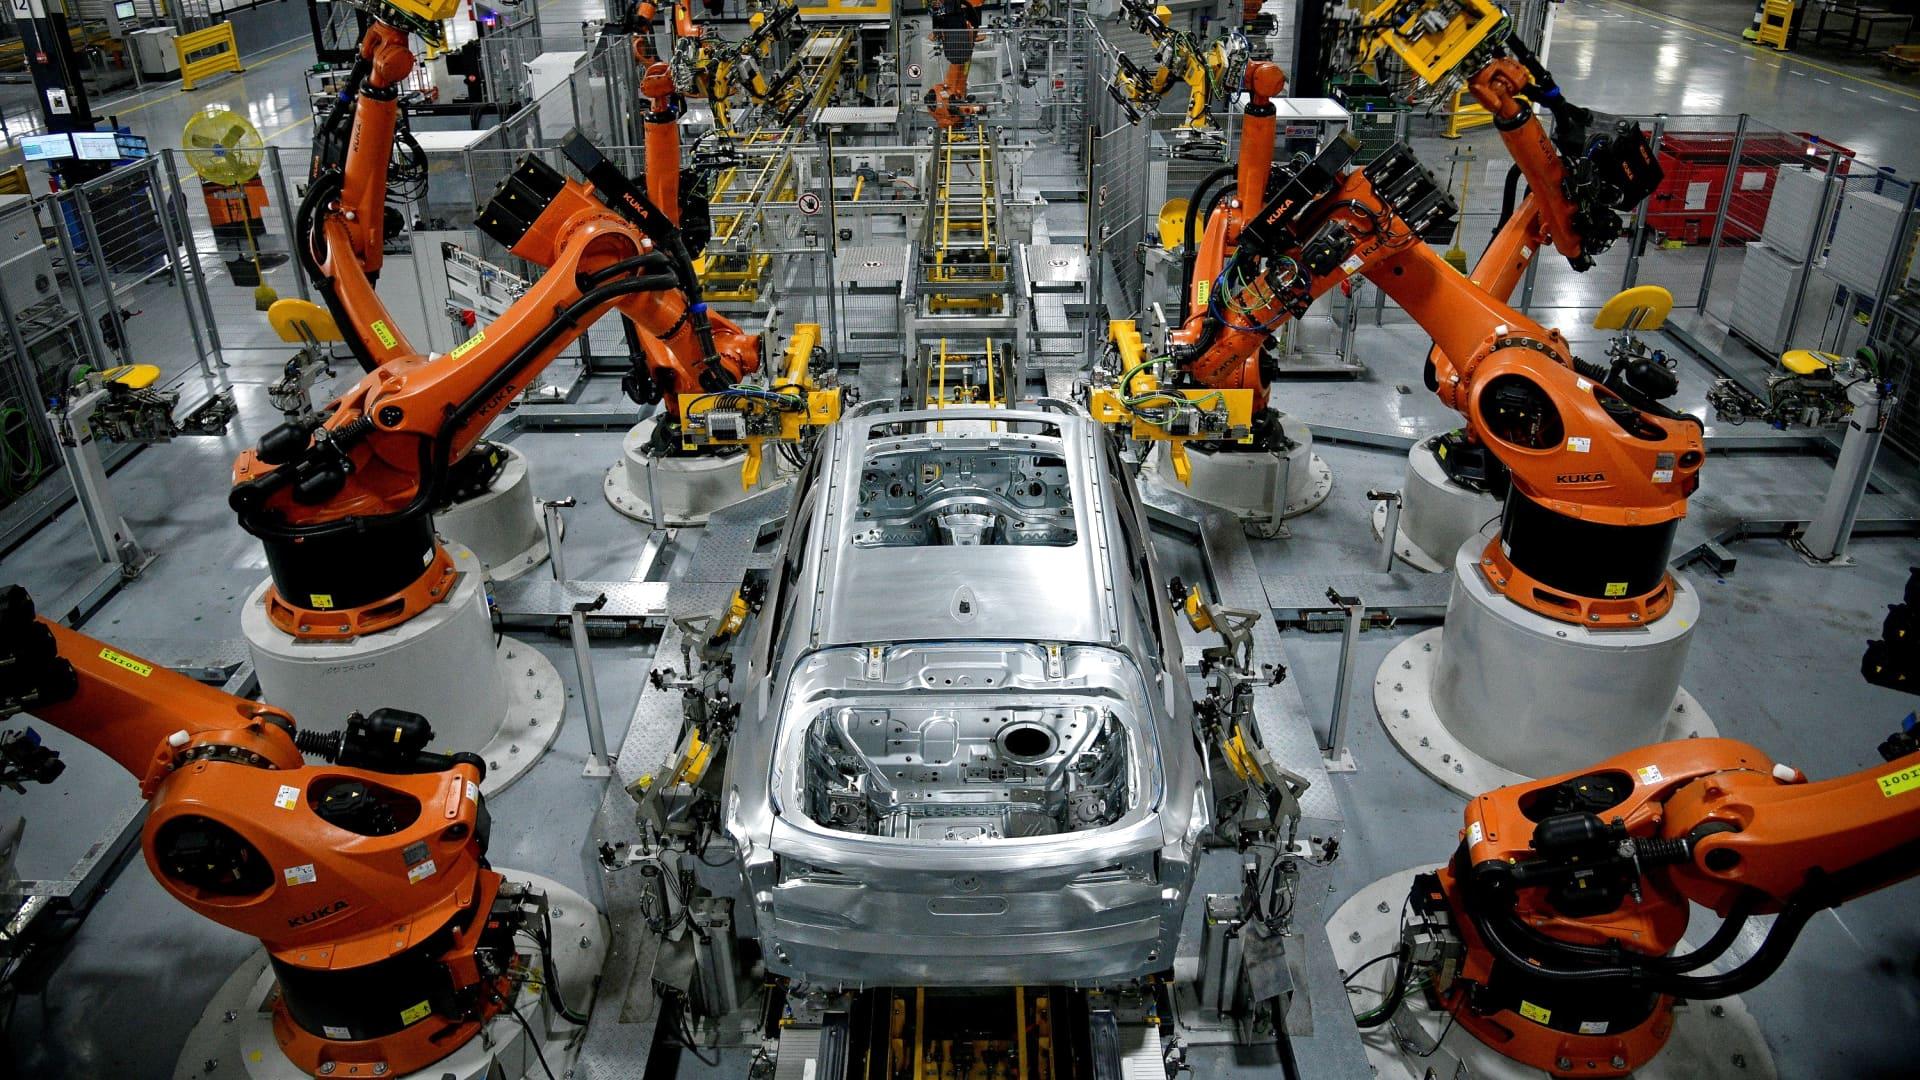 Autonomous robots assemble an X model SUV at the BMW manufacturing facility in Greer, South Carolina, U.S. November 4, 2019.